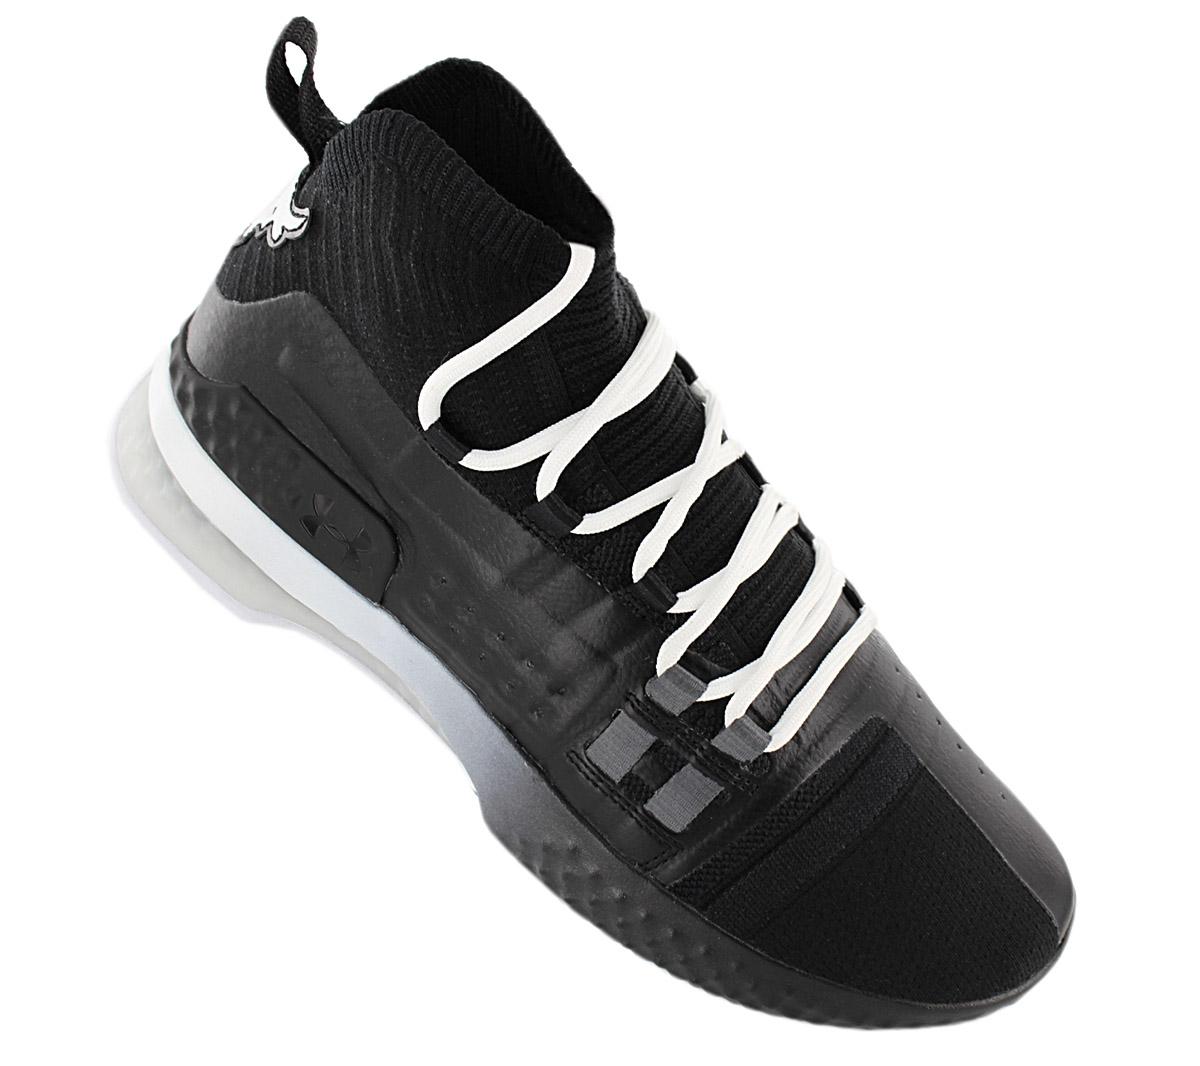 Details about UA Under Armour Project The Rock 3020788 001 Mens Trainer Sports Shoes New show original title